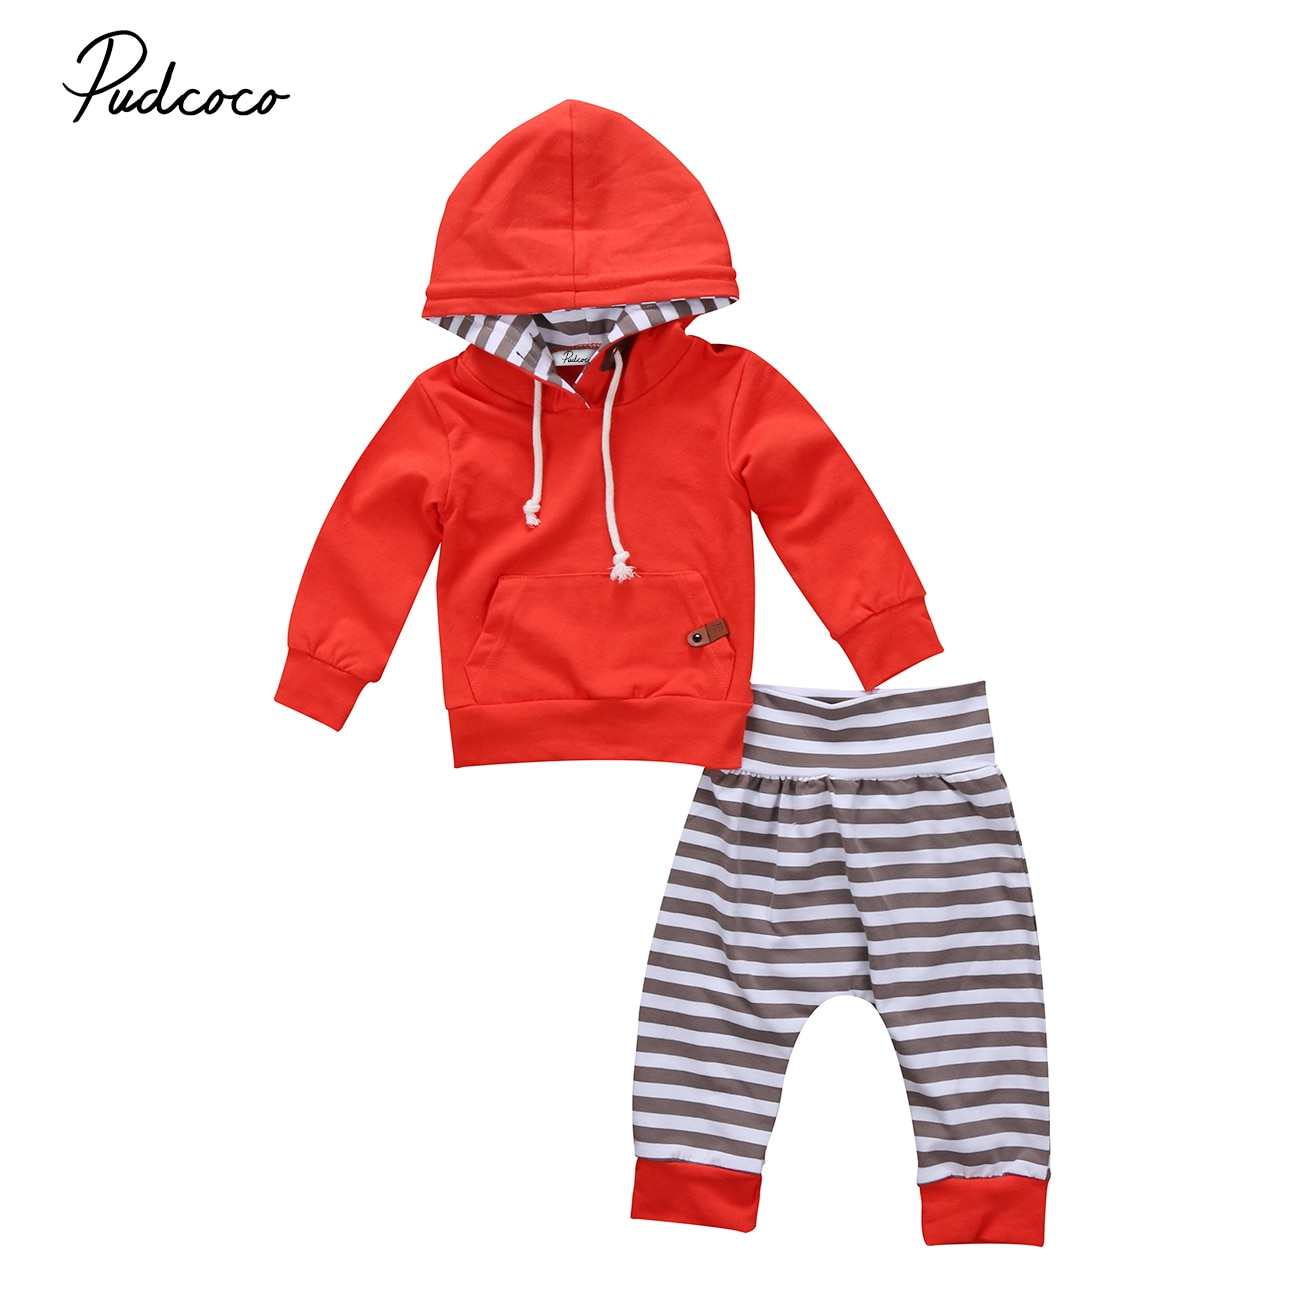 2 uds. Ropa para bebés recién nacidos, Ropa para Niñas, manga larga, raya de Bolsillo grande, camiseta con capucha, Tops, pantalones a rayas, conjunto de atuendo